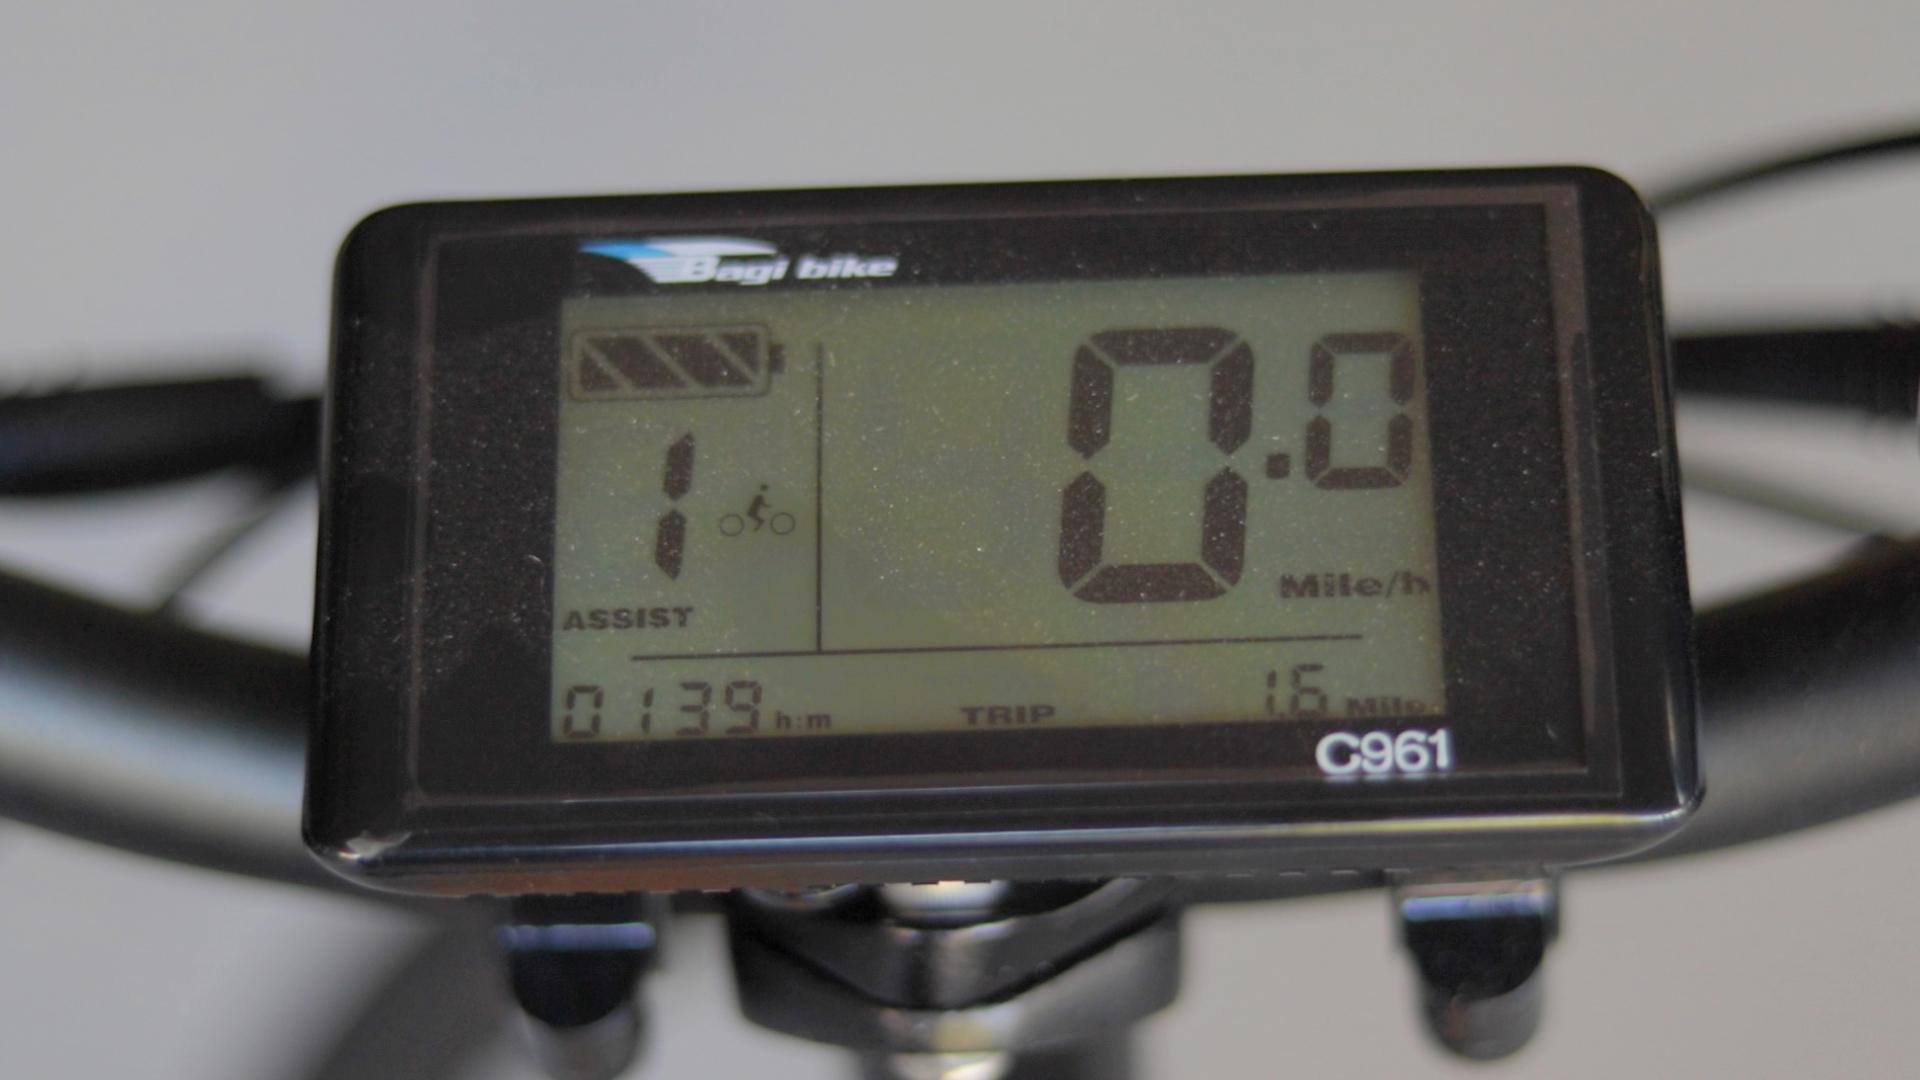 electrified-reviews-bagibike-b10-foldign-electric-bike-review-bafang-display.jpg